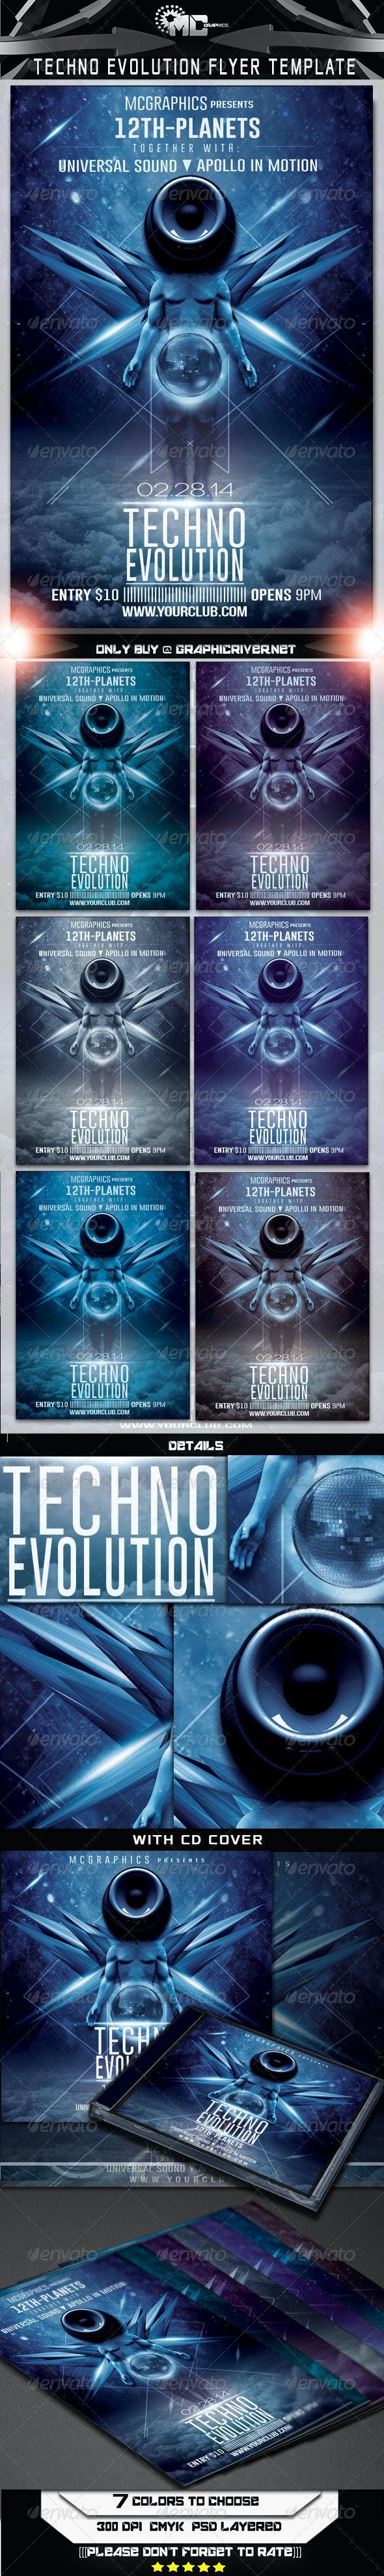 Techno Evolution Flyer Template - Flyers Print Templates